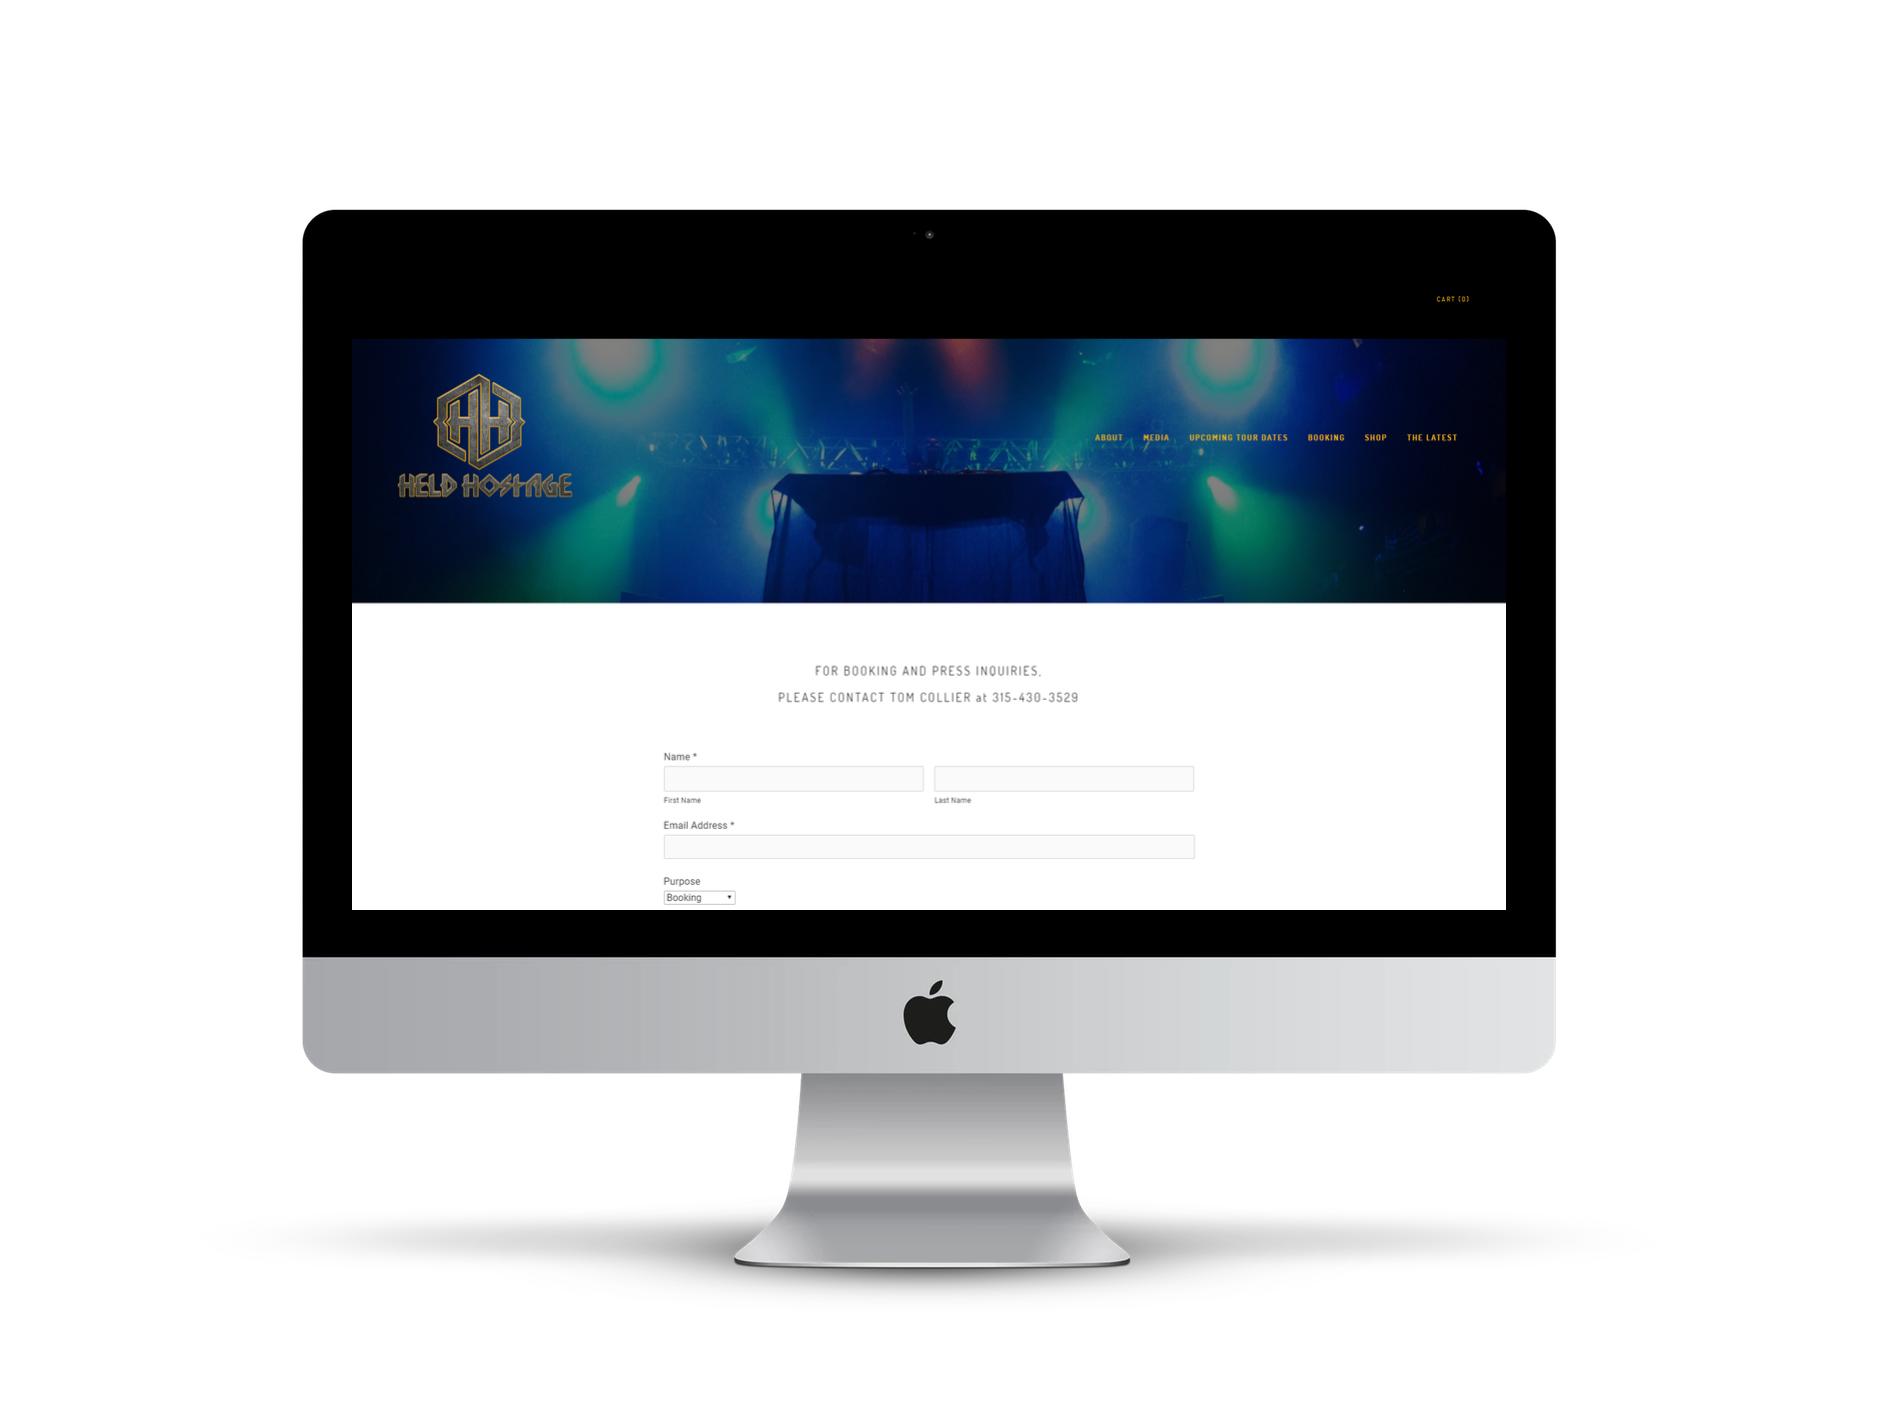 Website Design Services, 315 Designs